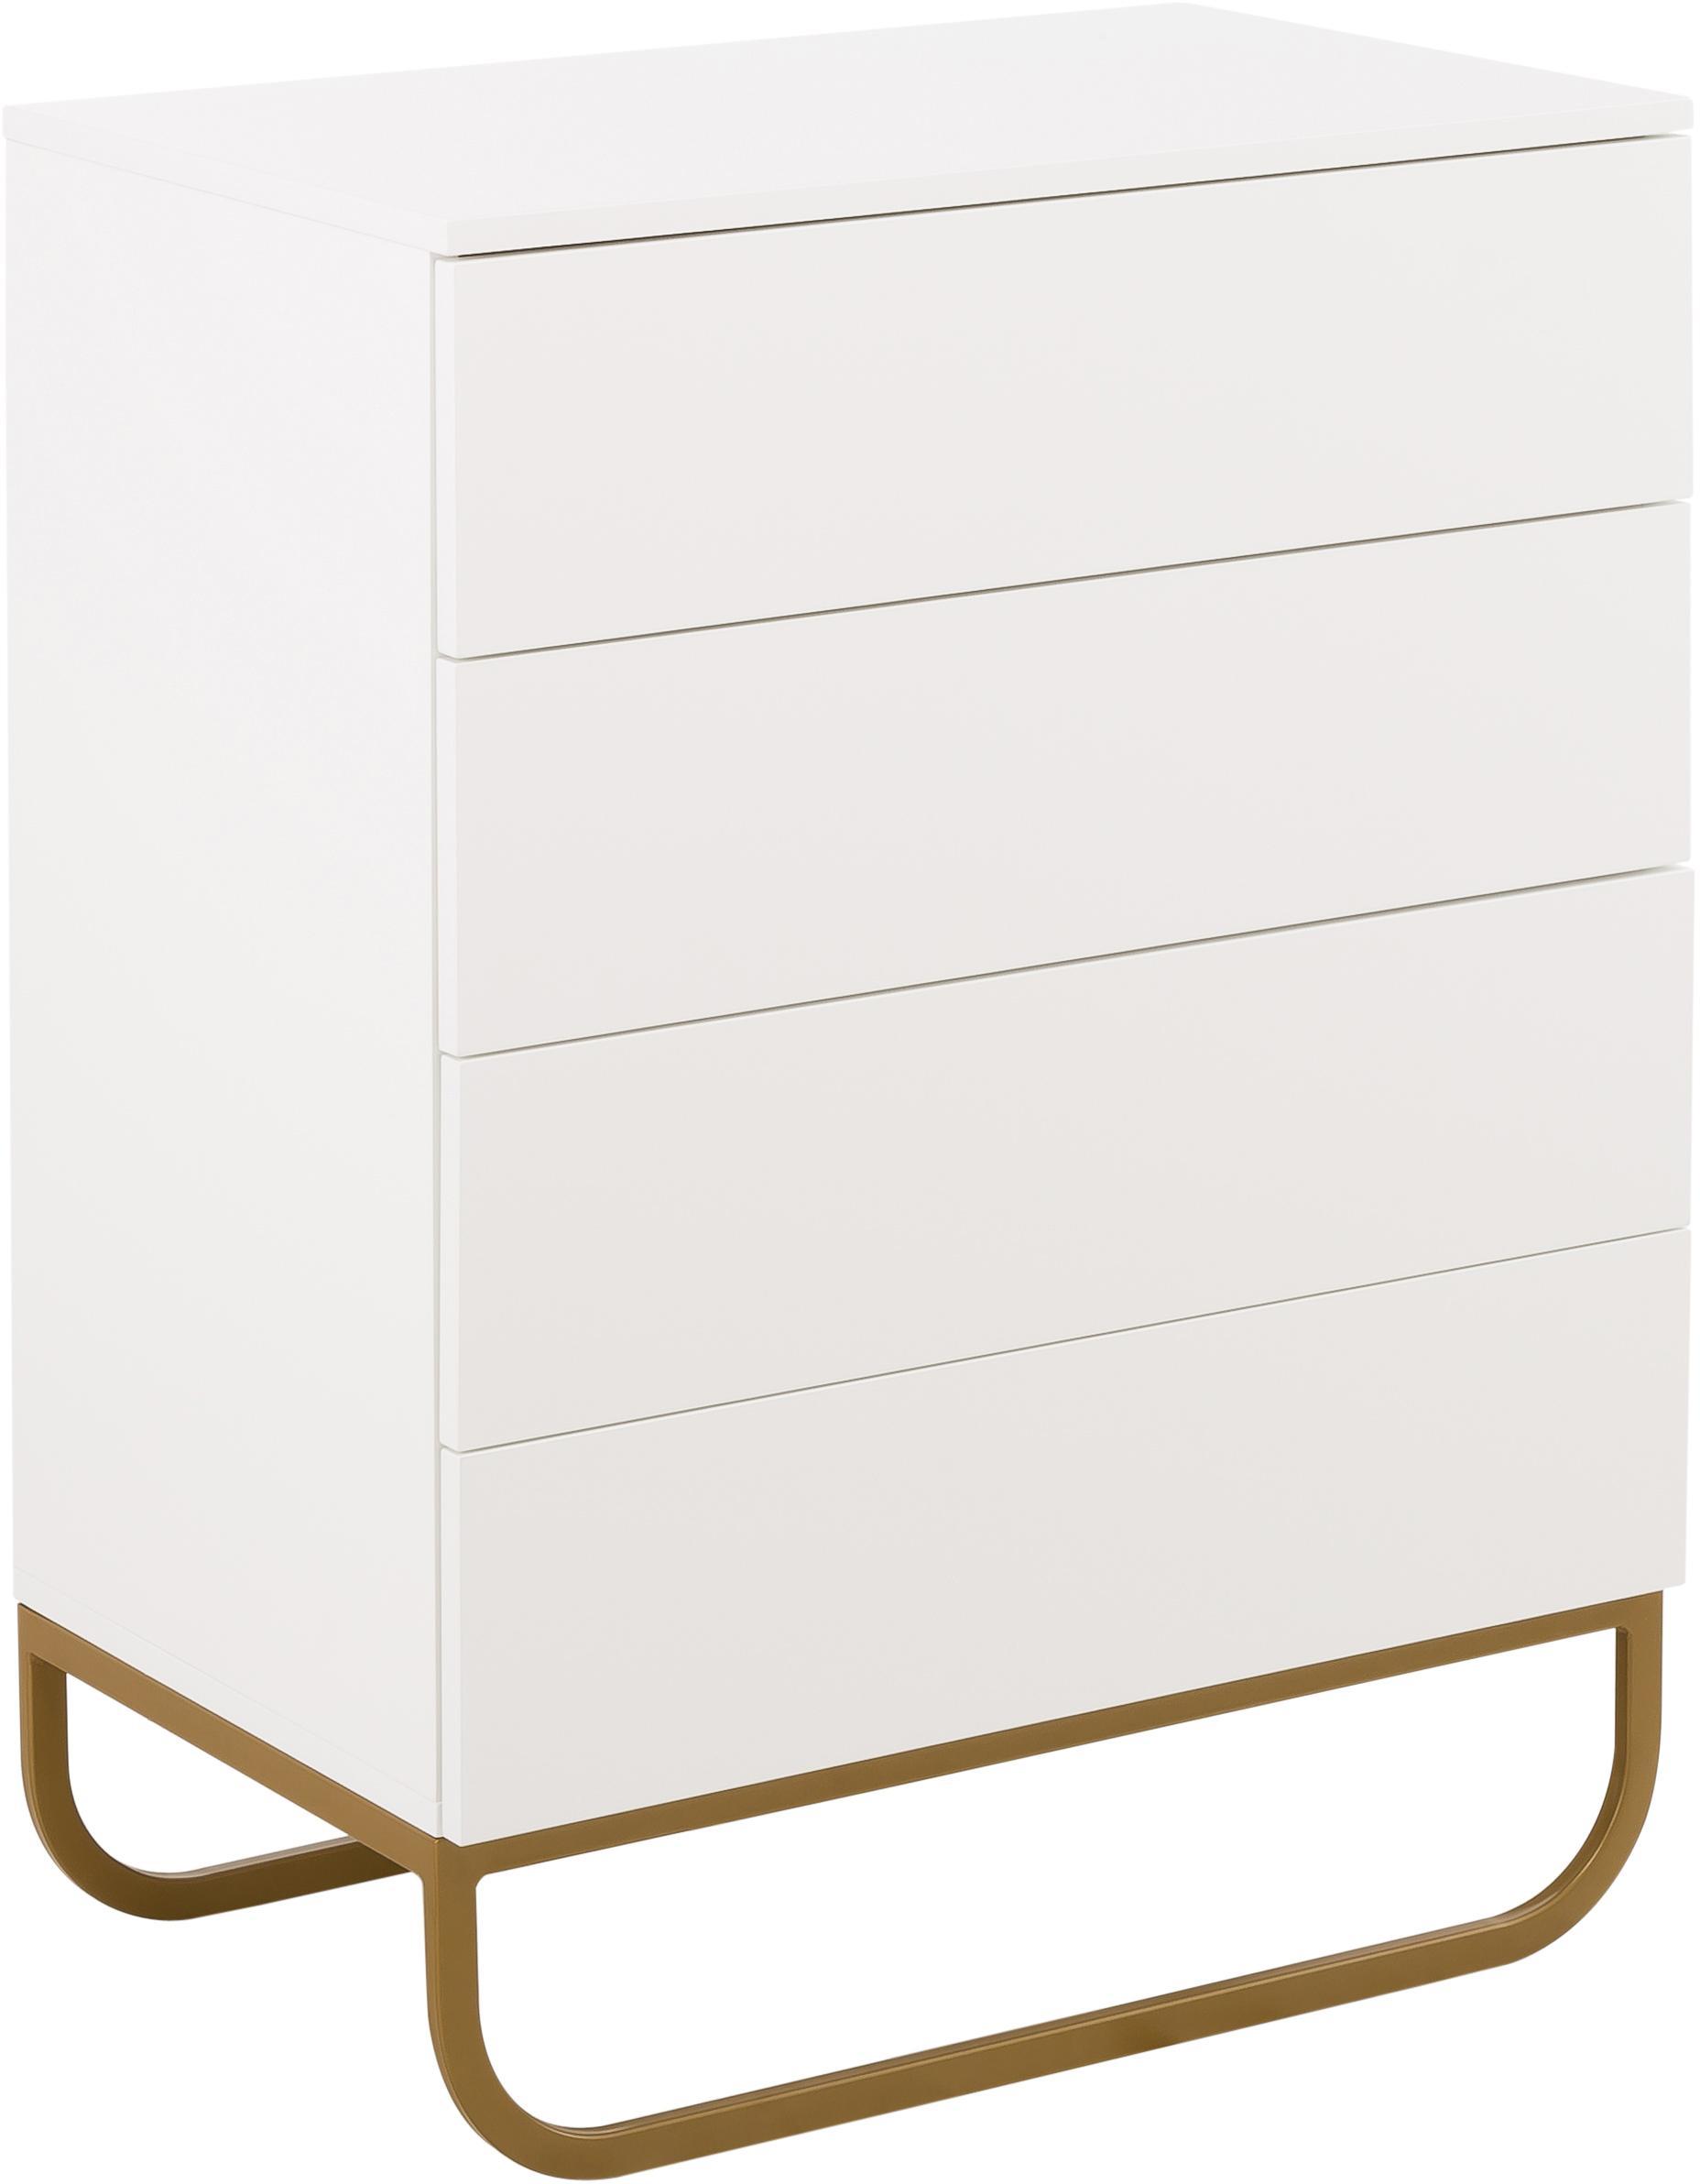 Schubladenkommode Sanford in Weiss, Korpus: Mitteldichte Holzfaserpla, Korpus: Weiss, mattFussgestell: Goldfarben, matt, 80 x 106 cm